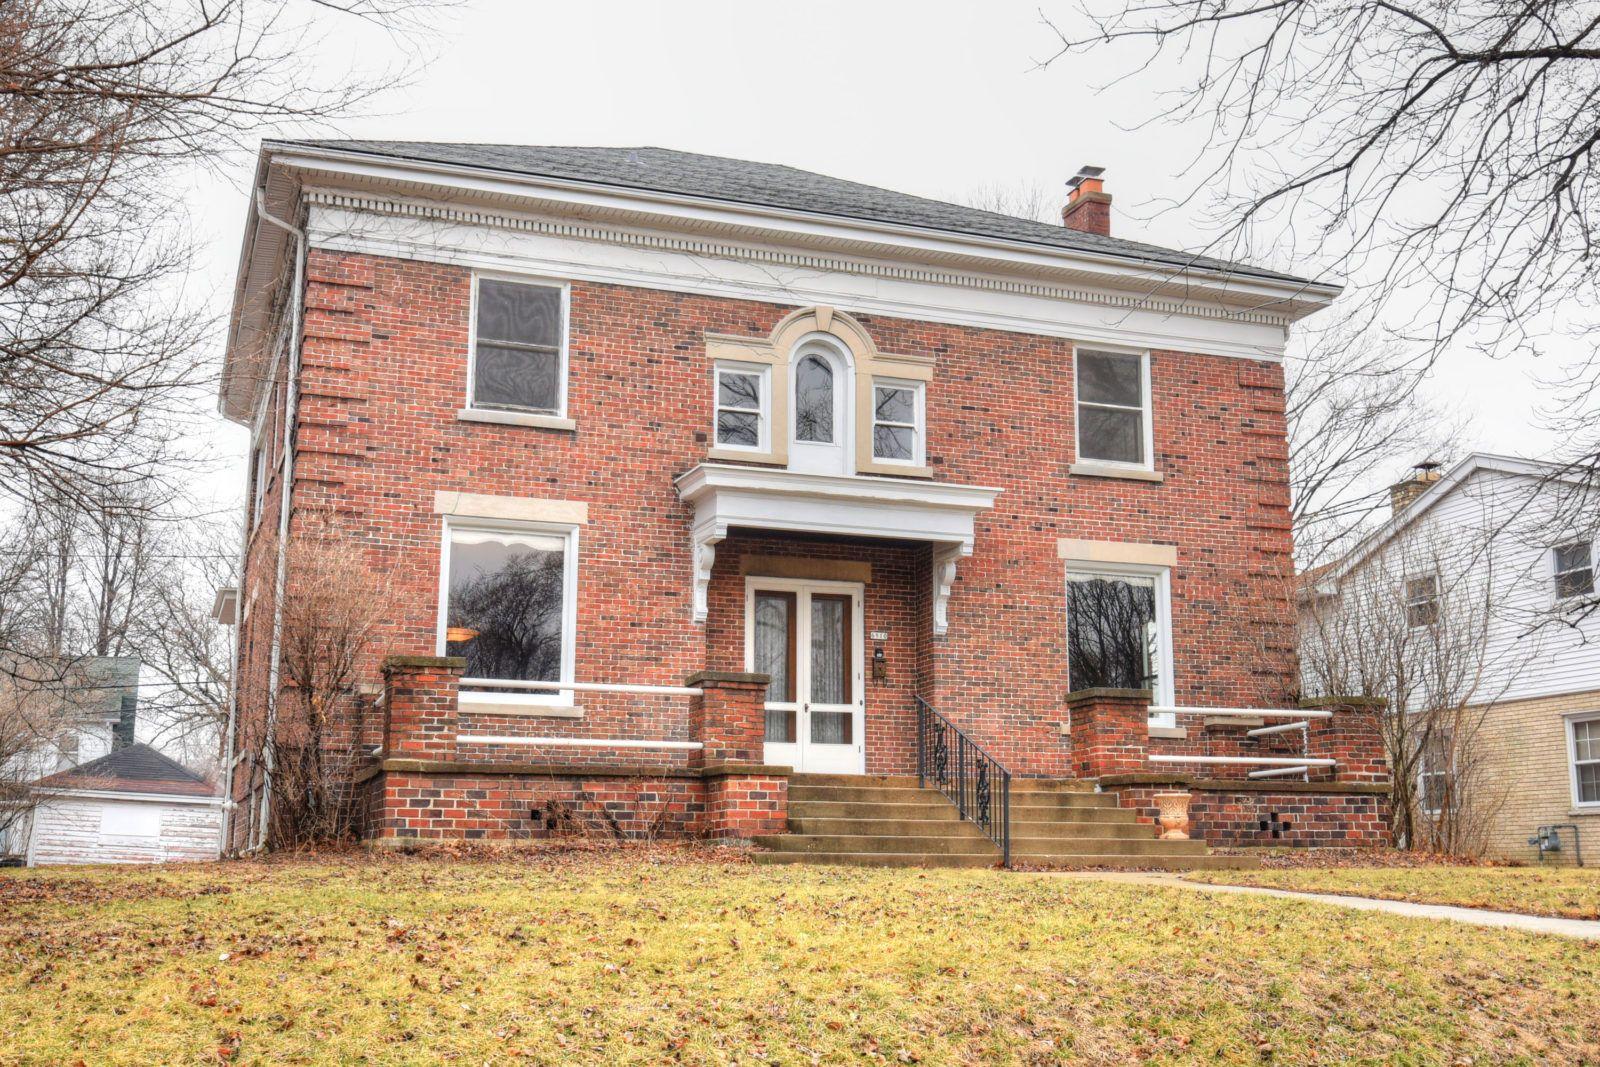 6910 W Wisconsin Ave Wauwatosa Wi 53213 Homes Around The World